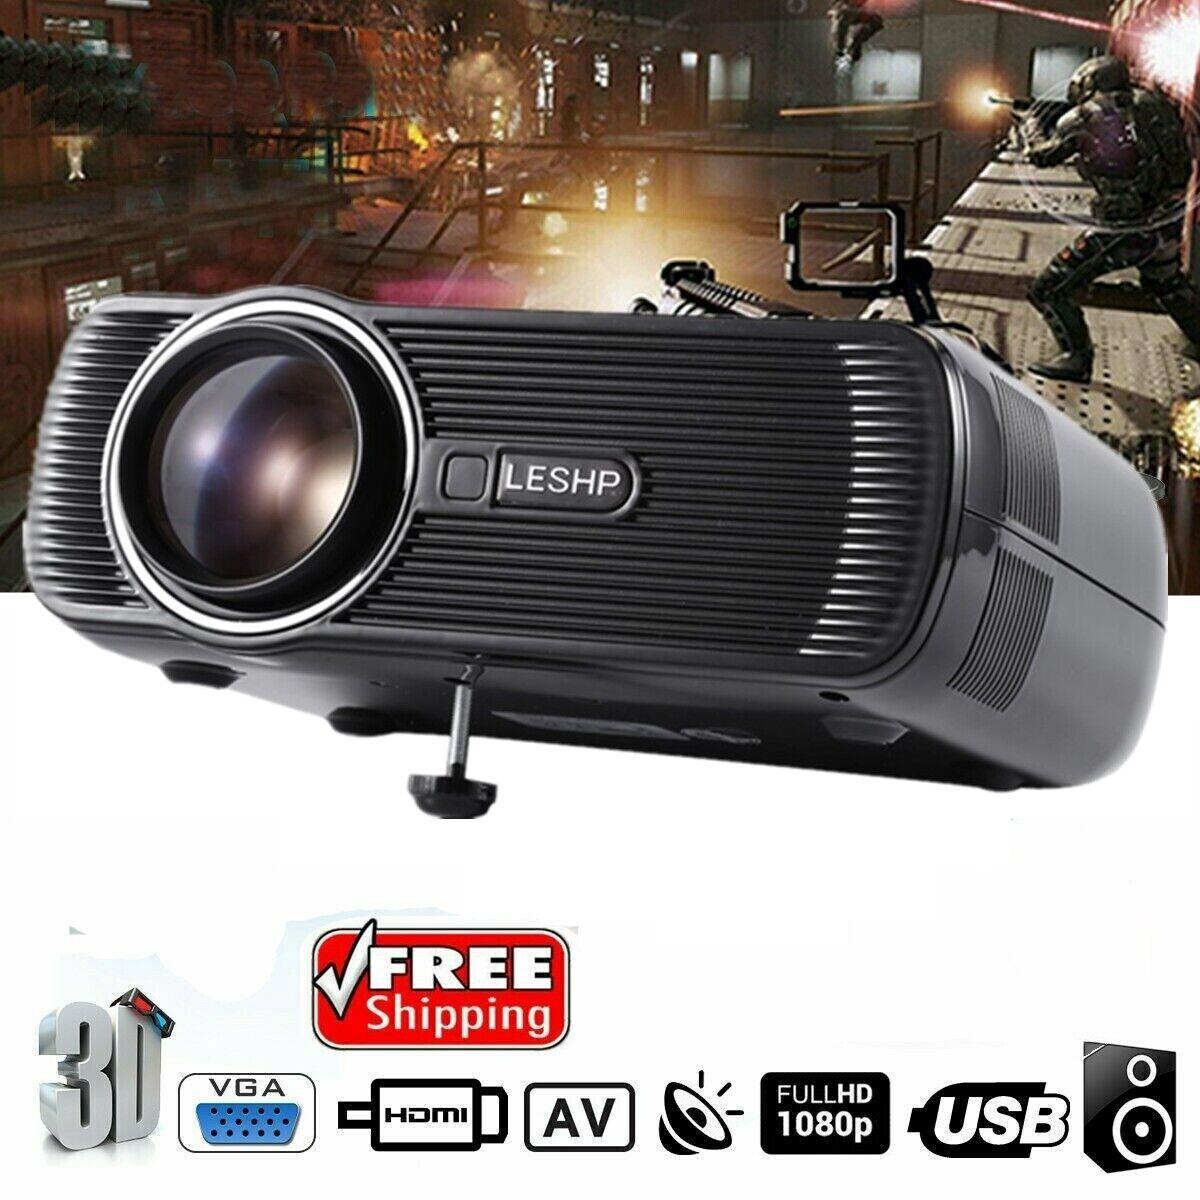 LED Projector Home Cinema BL-80 Support PC Laptop USB TV Box iPad  Smartphone US   eBay